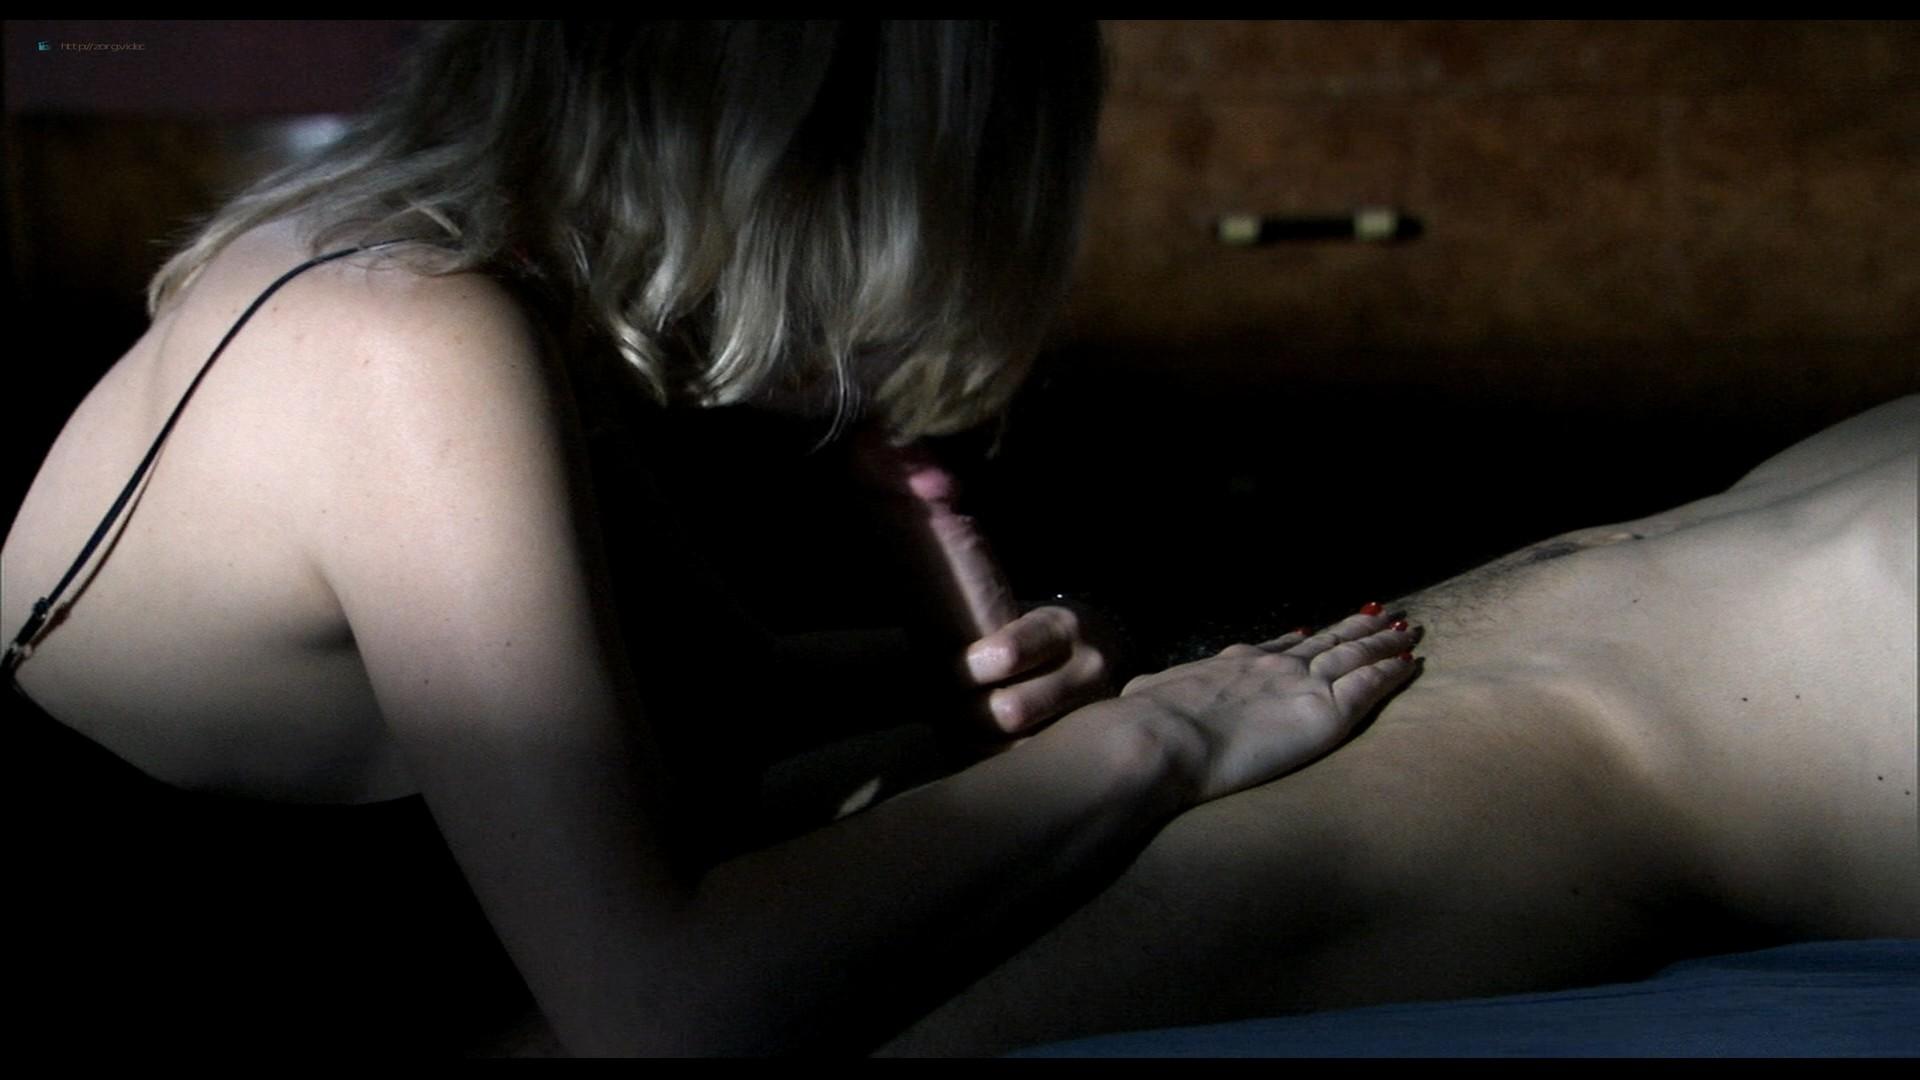 Anna Jimskaia nude explicit Nela Lucic nude - Monamour (2006) HD 1080p BluRay (r) (8)